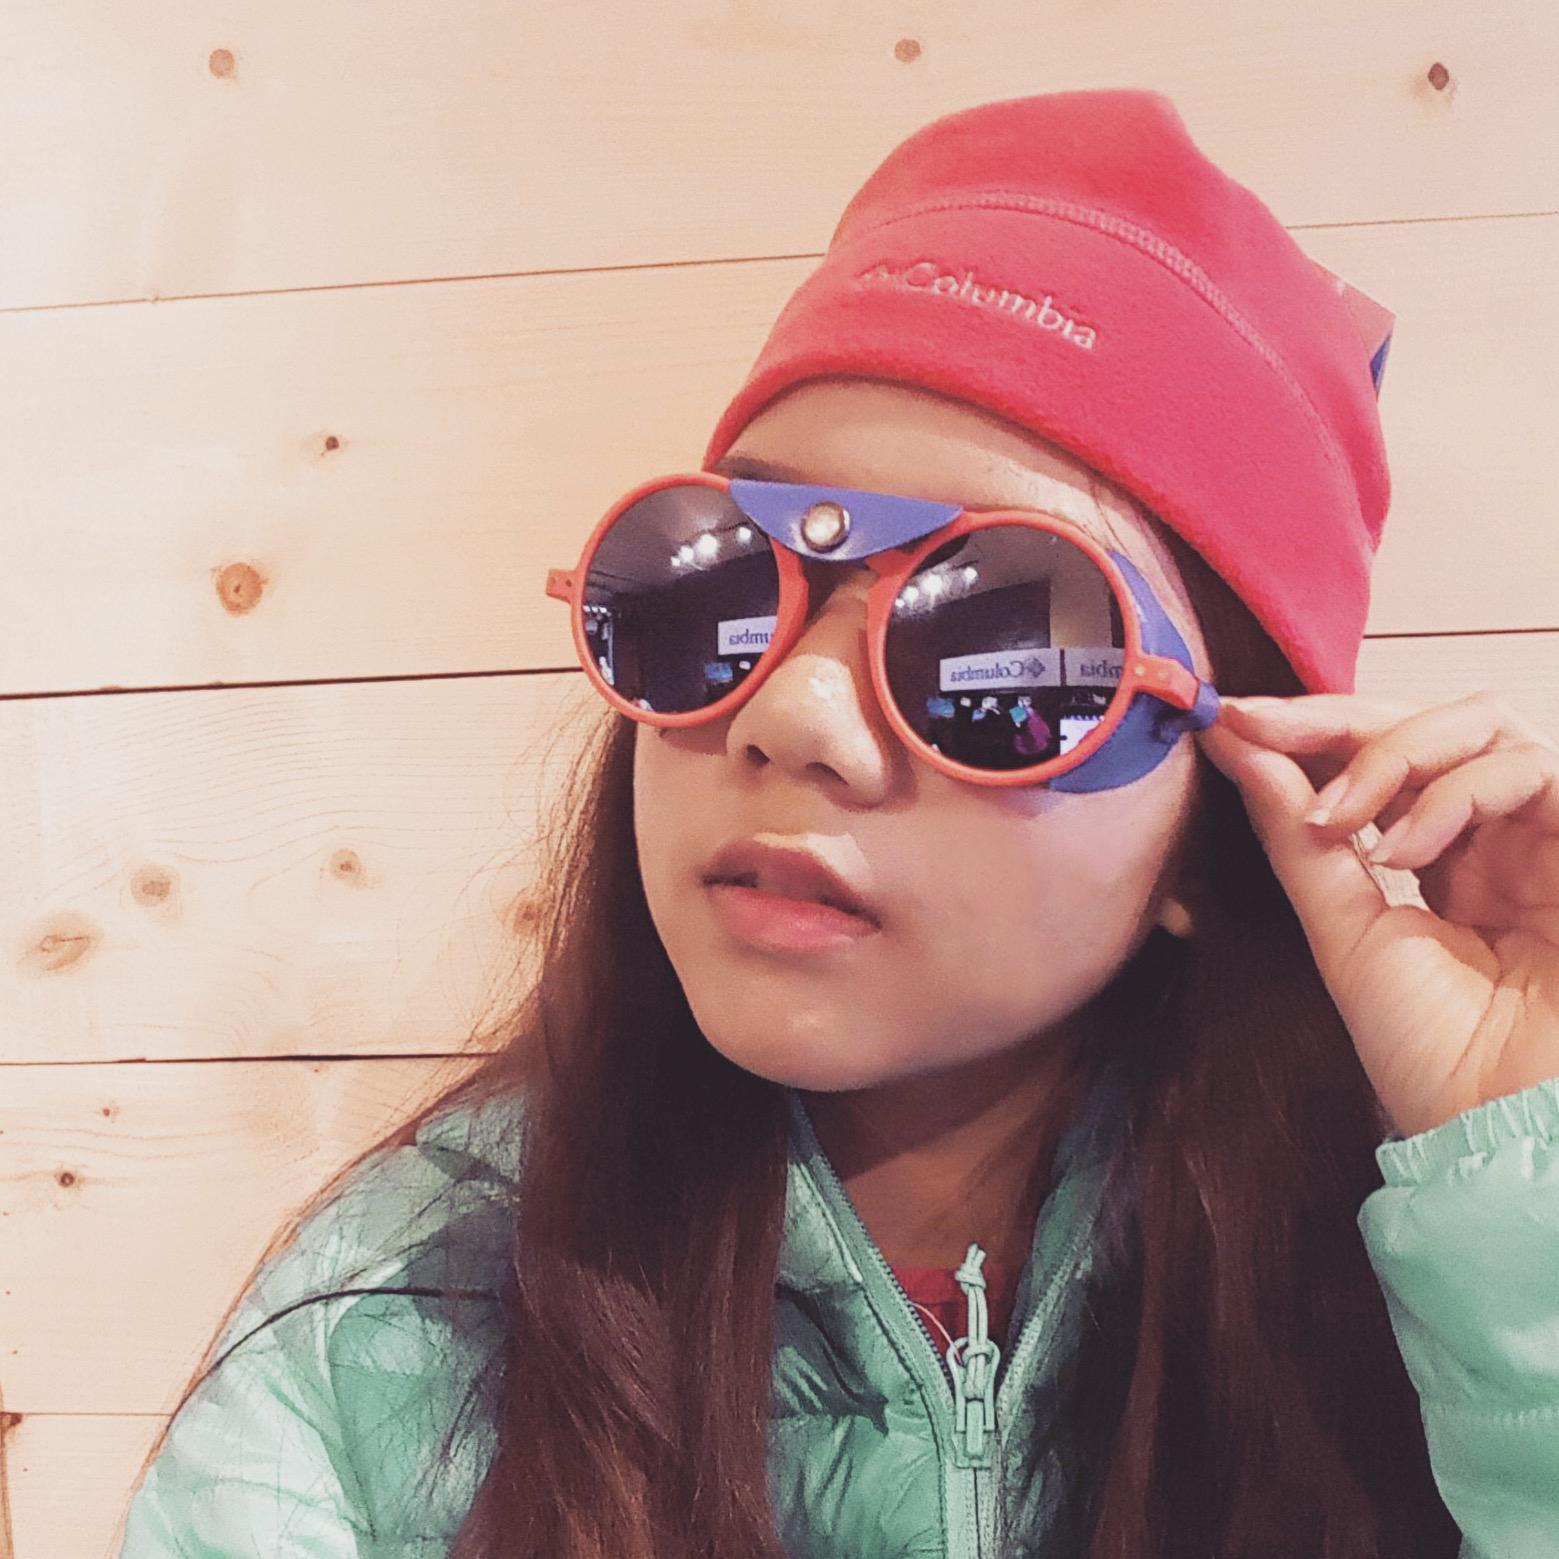 See Concept | Paris รุ่น Glacier สี Orange Neon แว่นกันแดด UV 100% ที่ The Puffin House